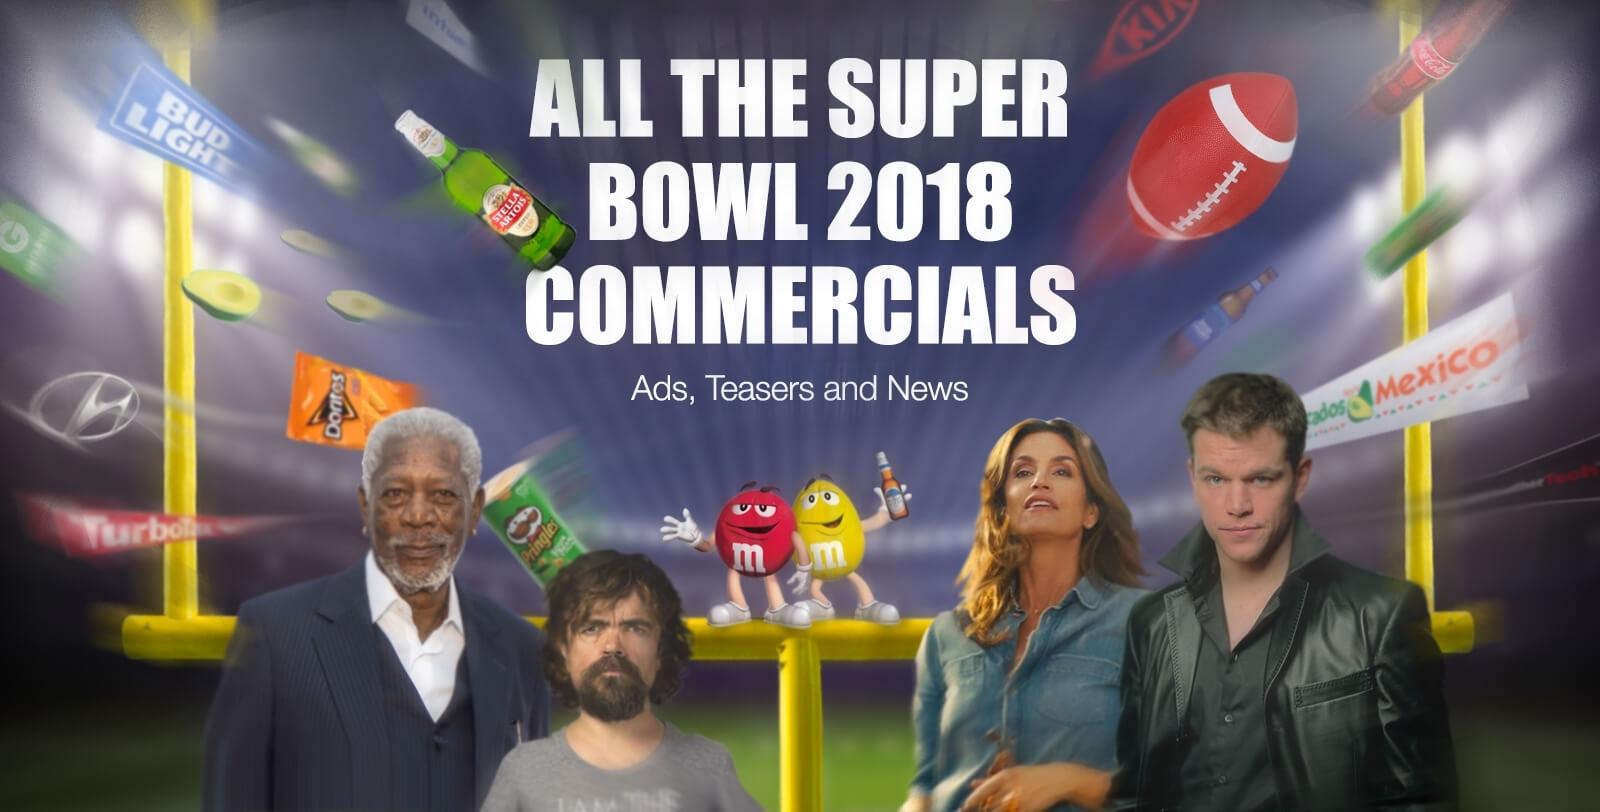 Super Bowl Commercials 2019 | All Super Bowl Liii Ads with Super Bowl Ads 2018